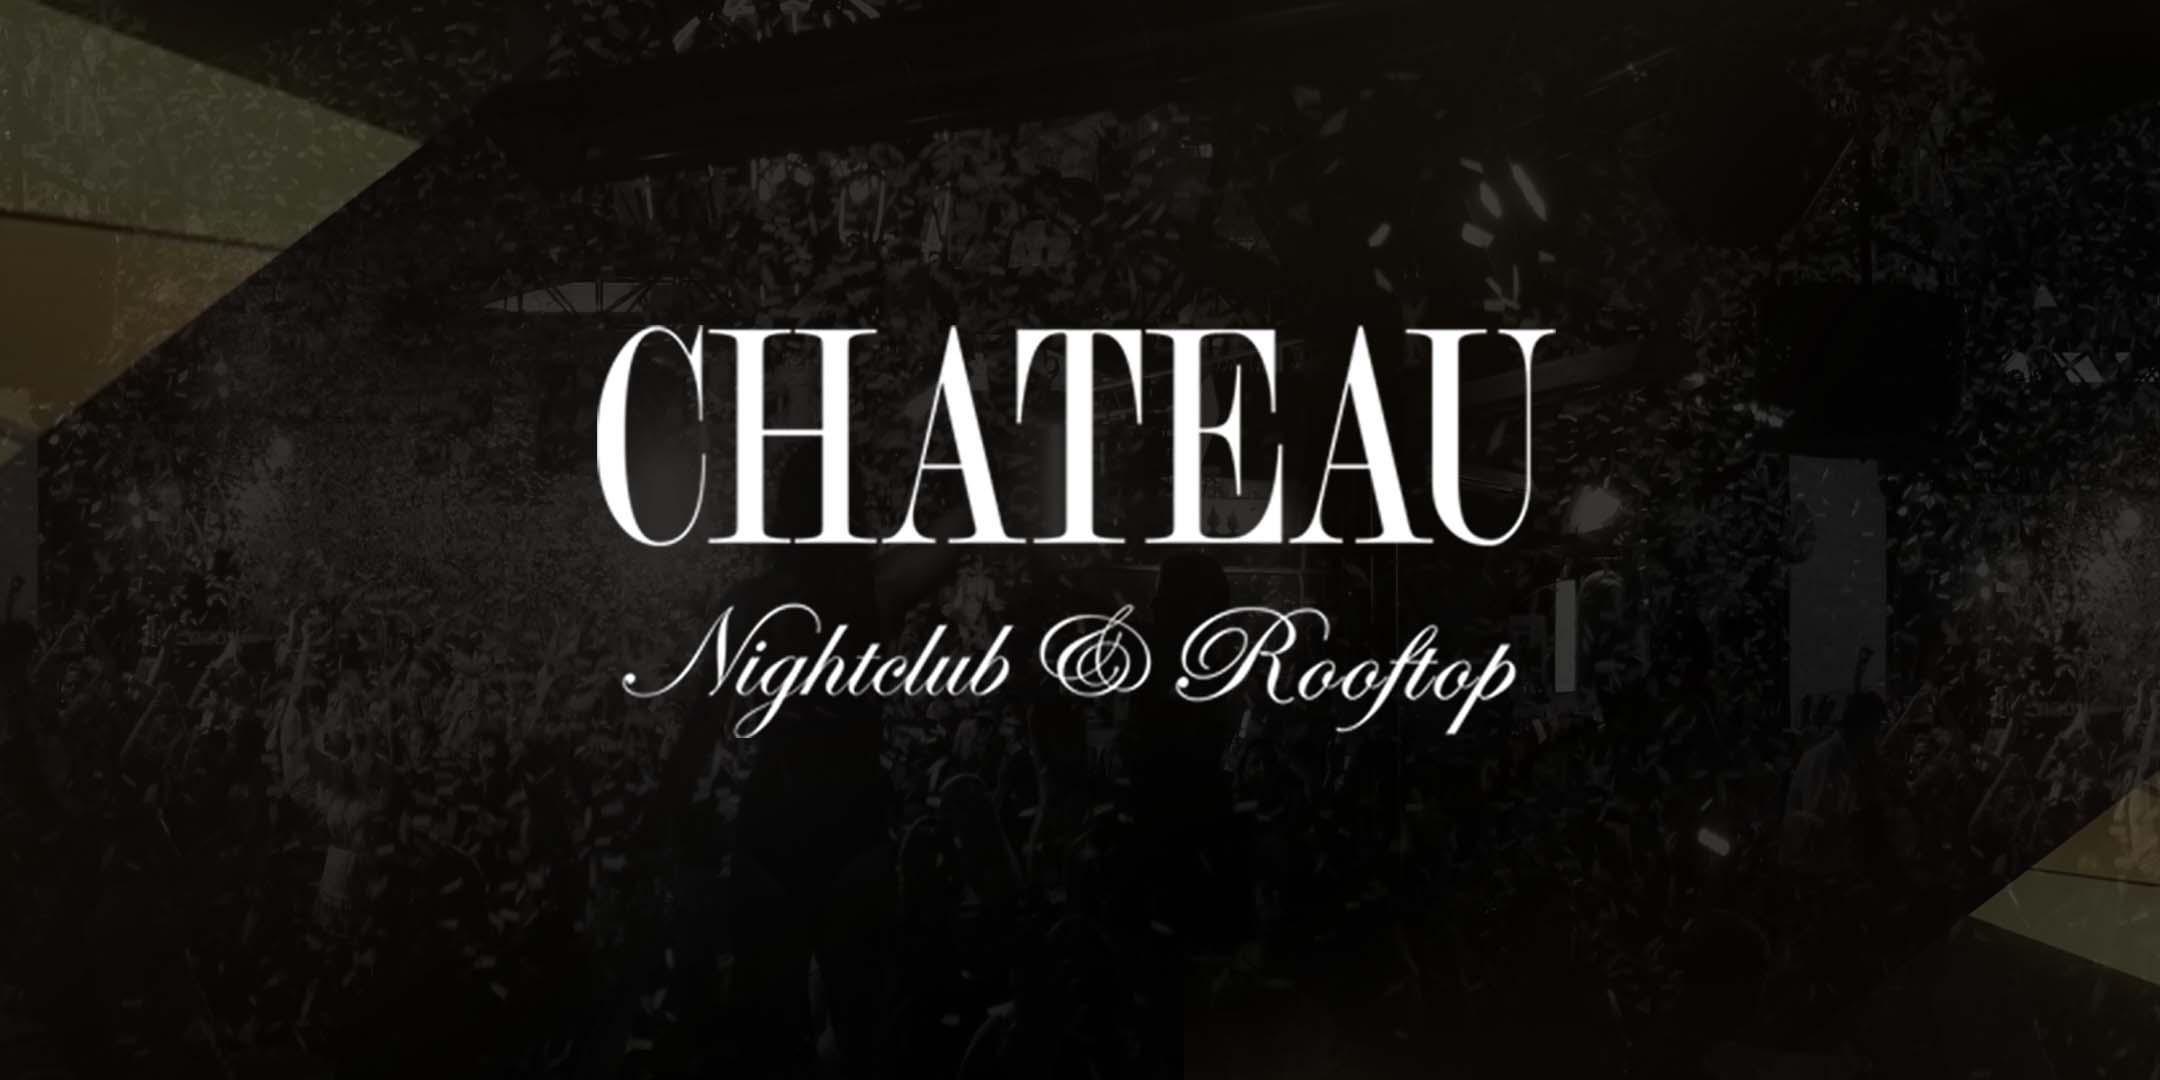 Chateau Nightclub & Rooftop - General Admission WEEKDAY TICKETS